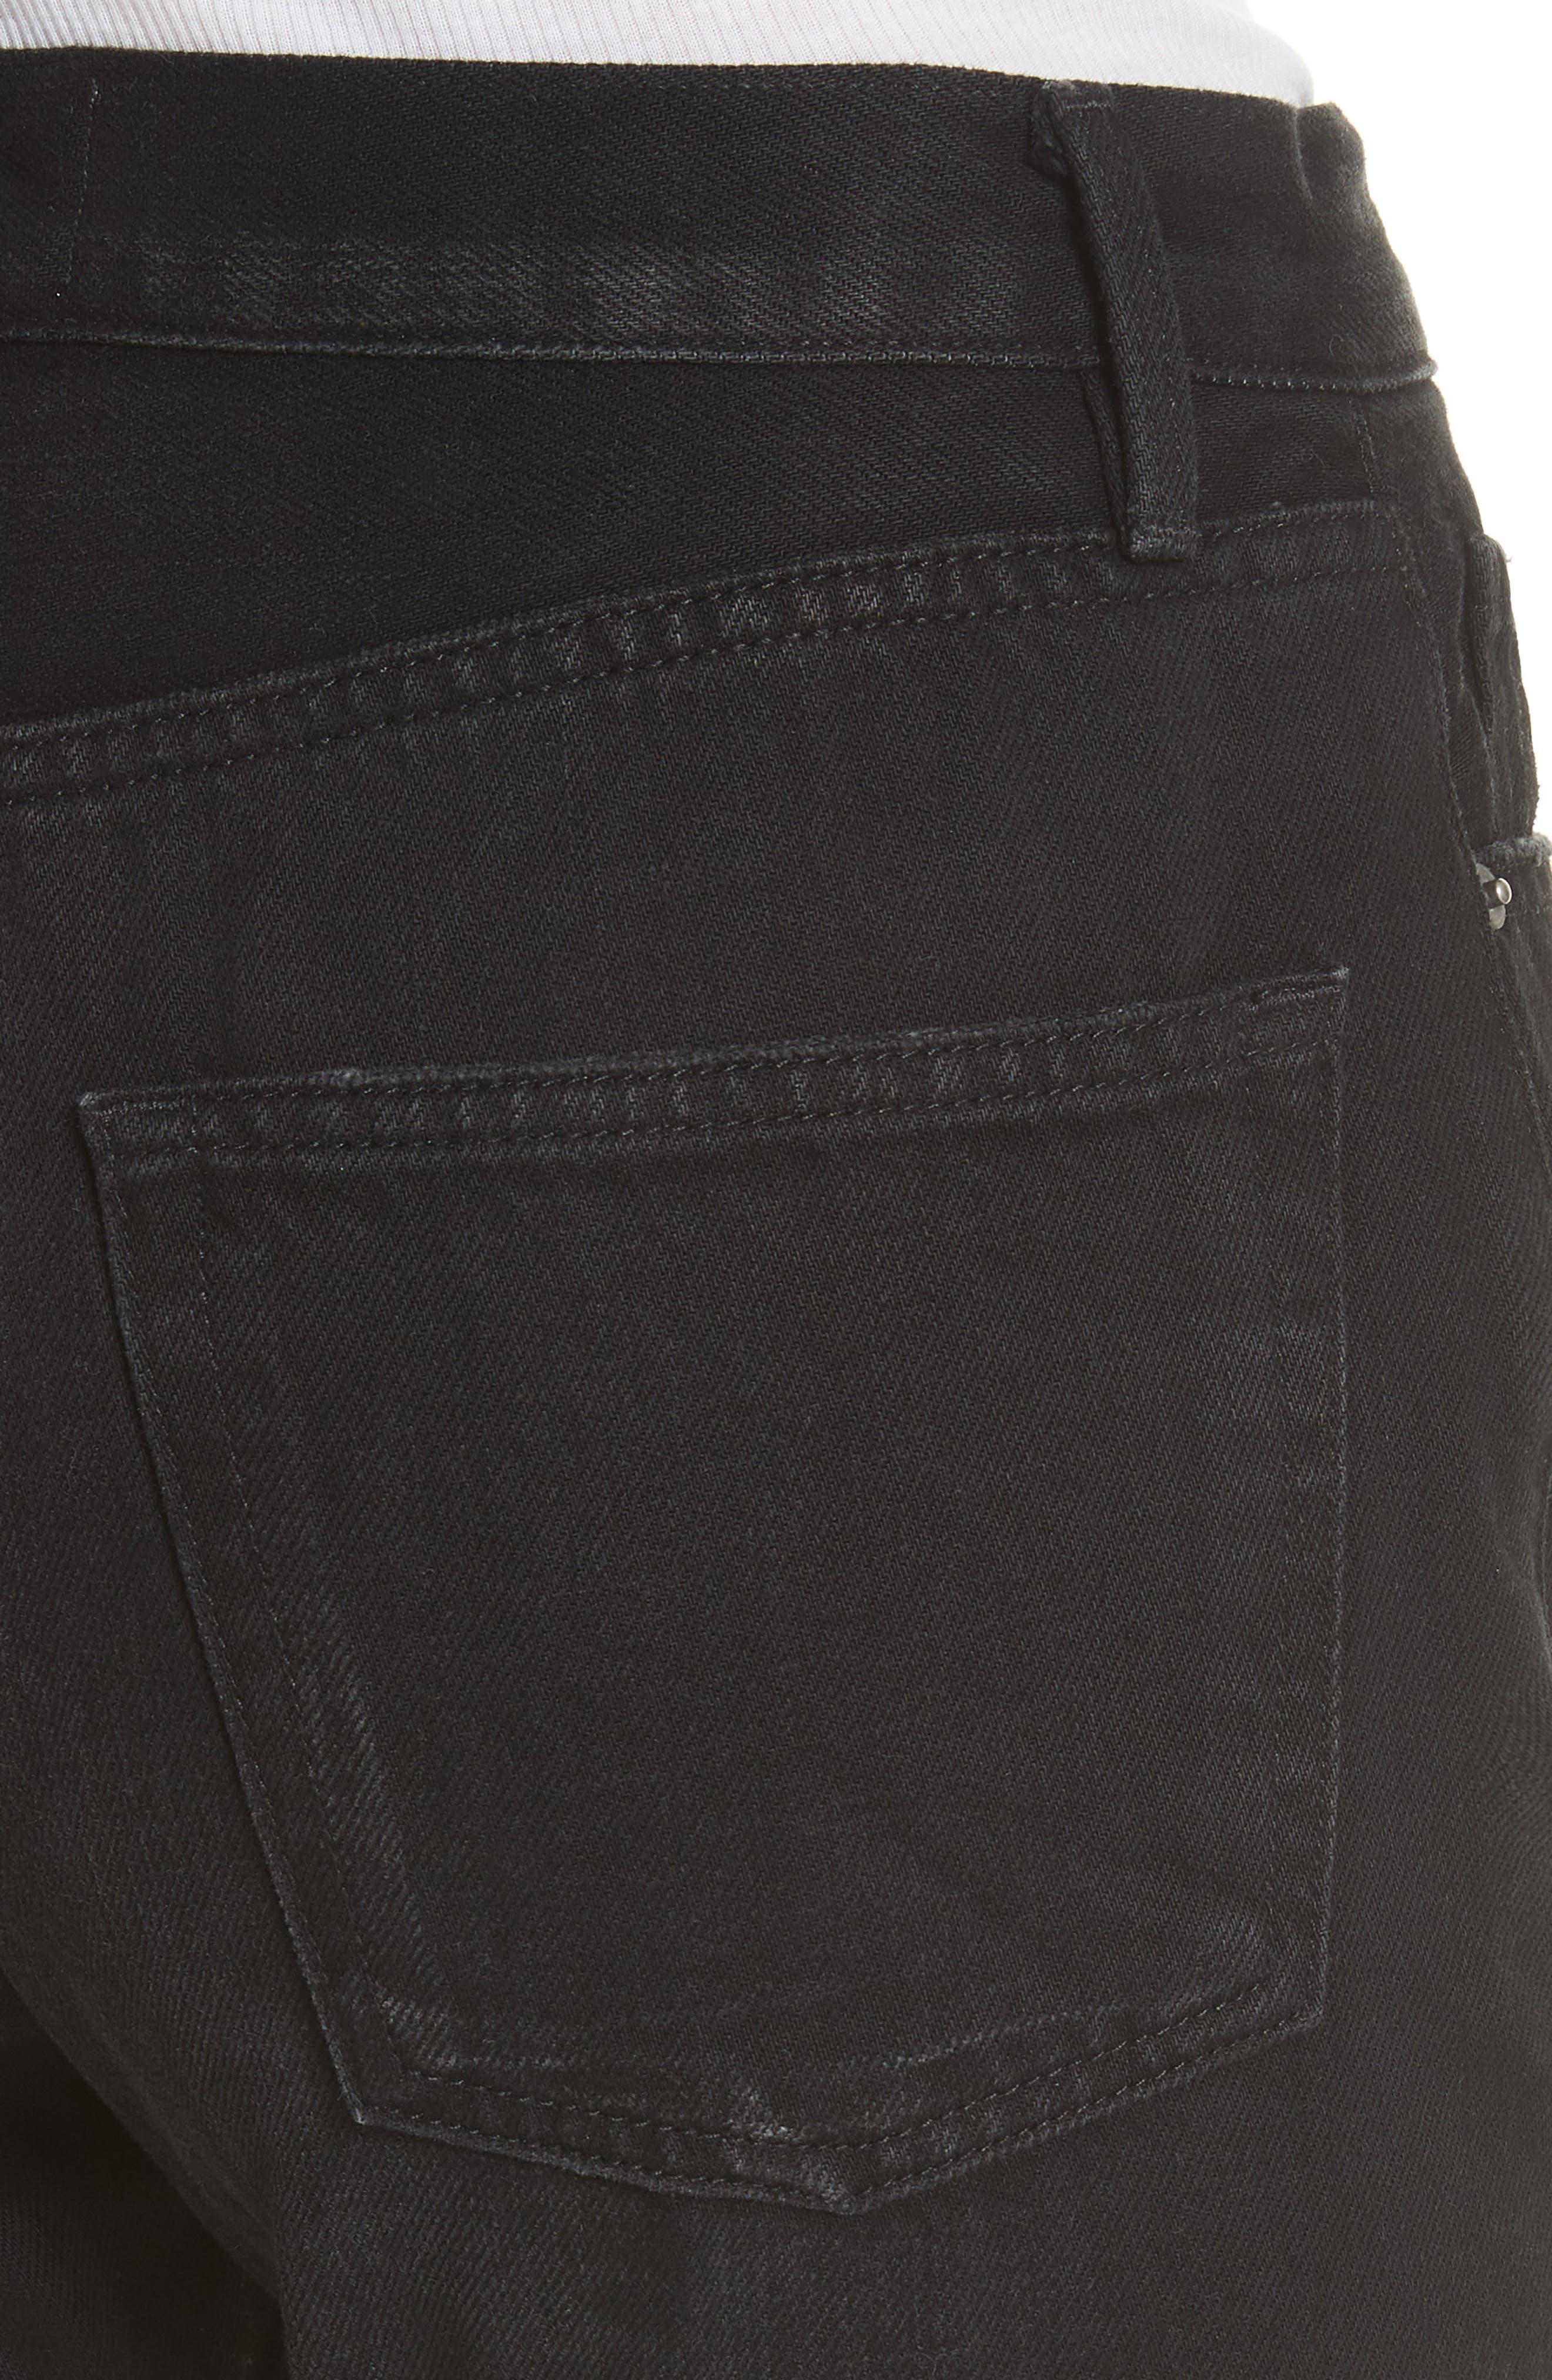 Le Original Released Hem High Waist Jeans,                             Alternate thumbnail 4, color,                             001